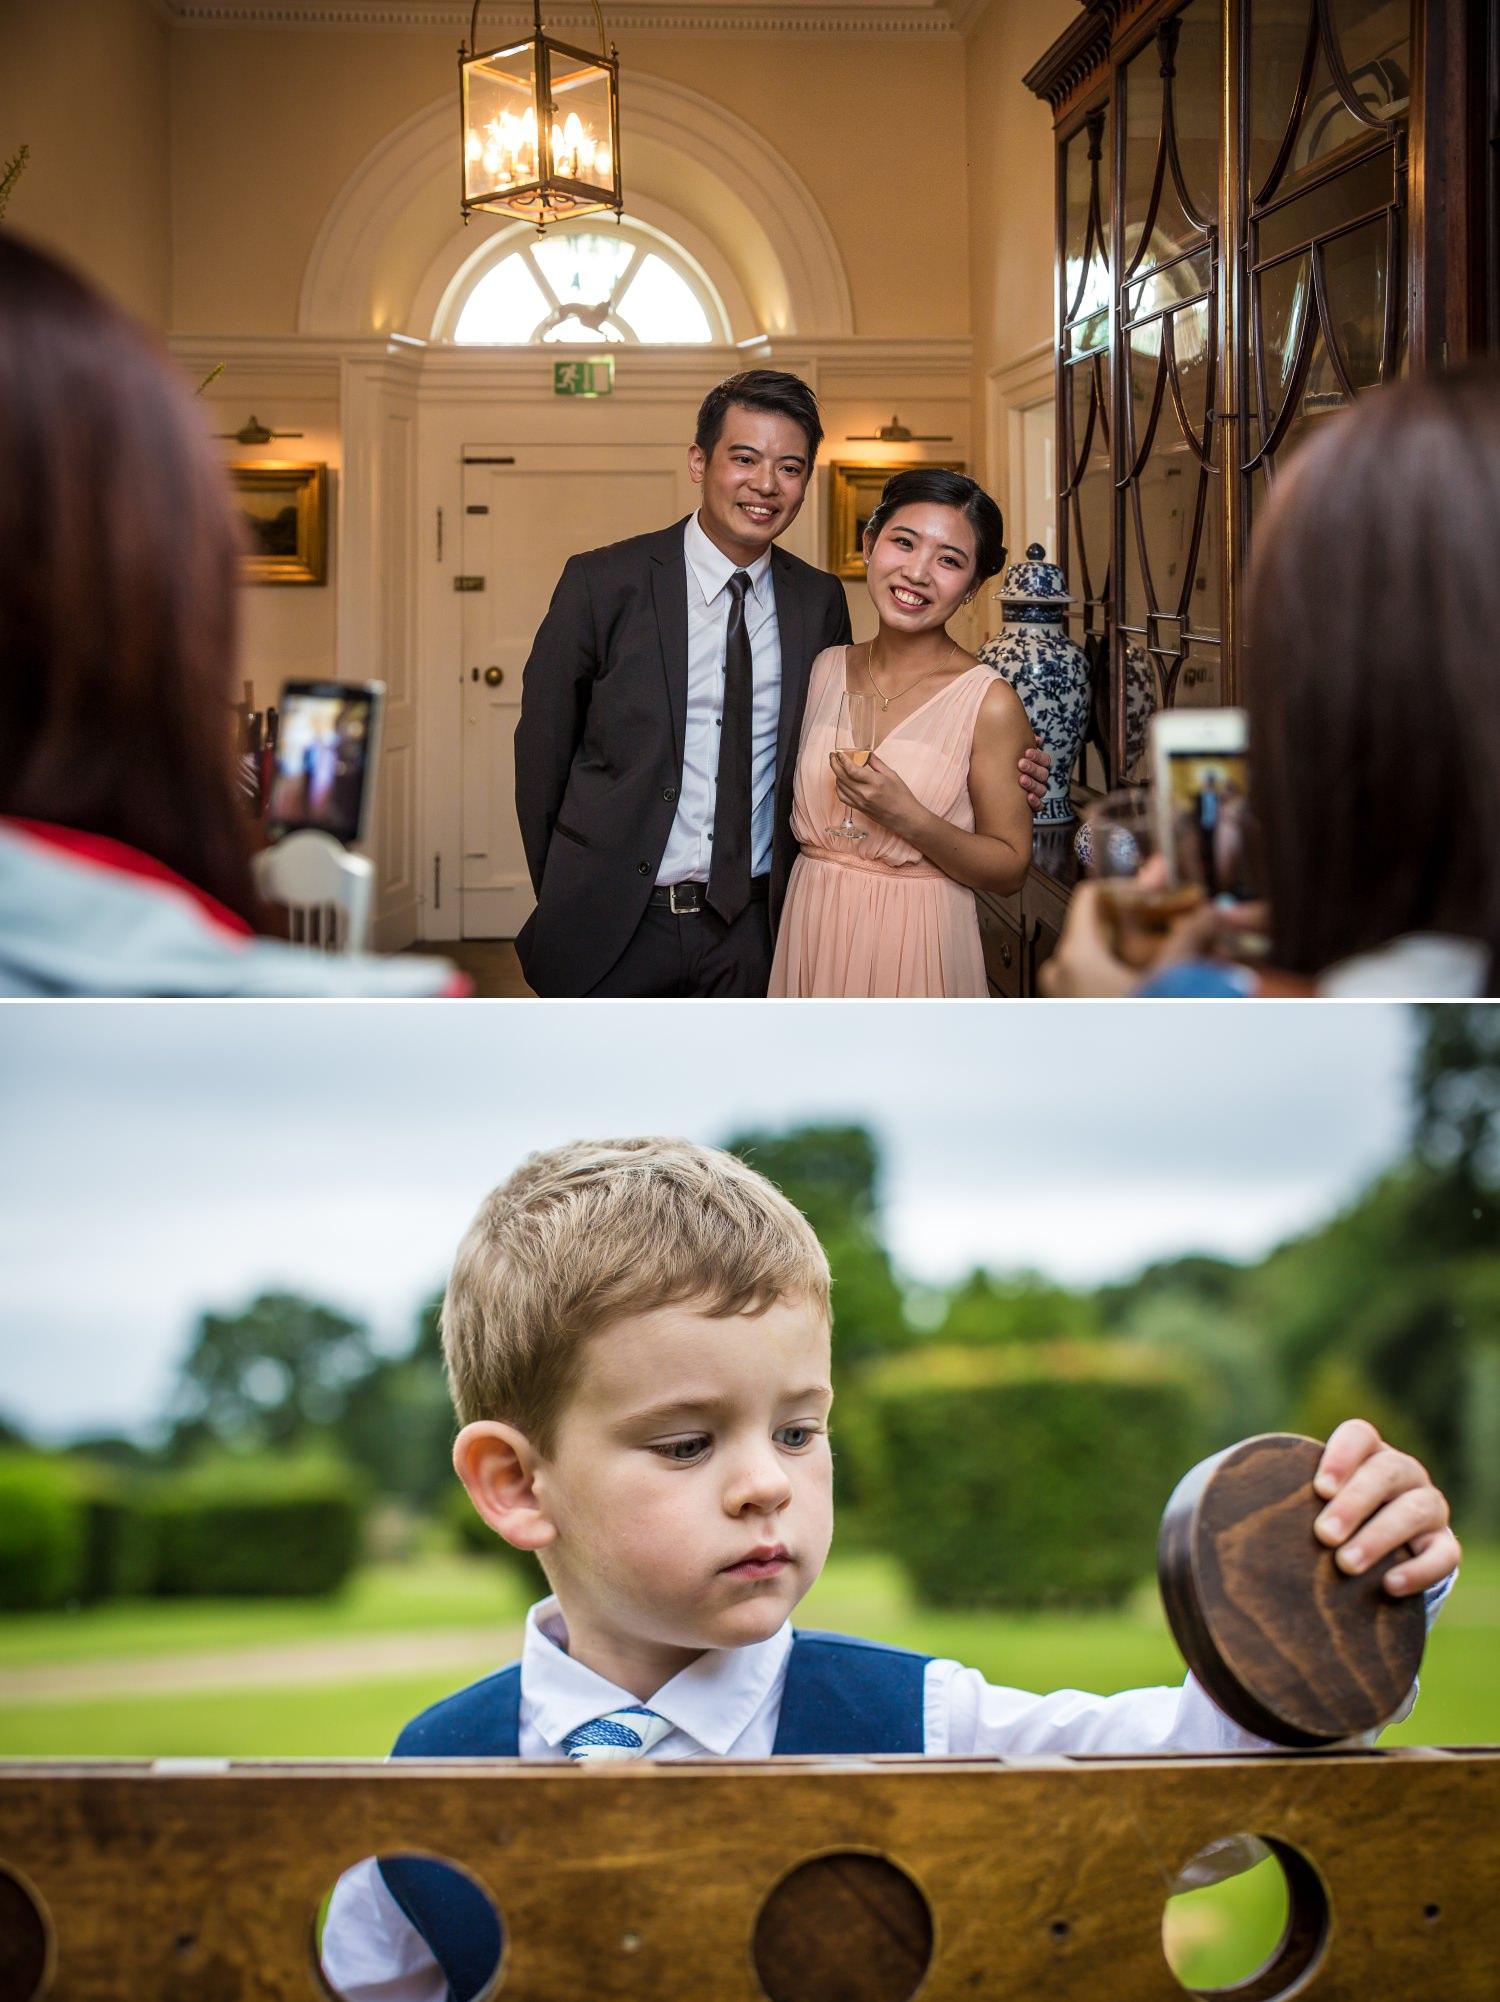 Wedding Photographs of guests mingling at Iscoyd Park